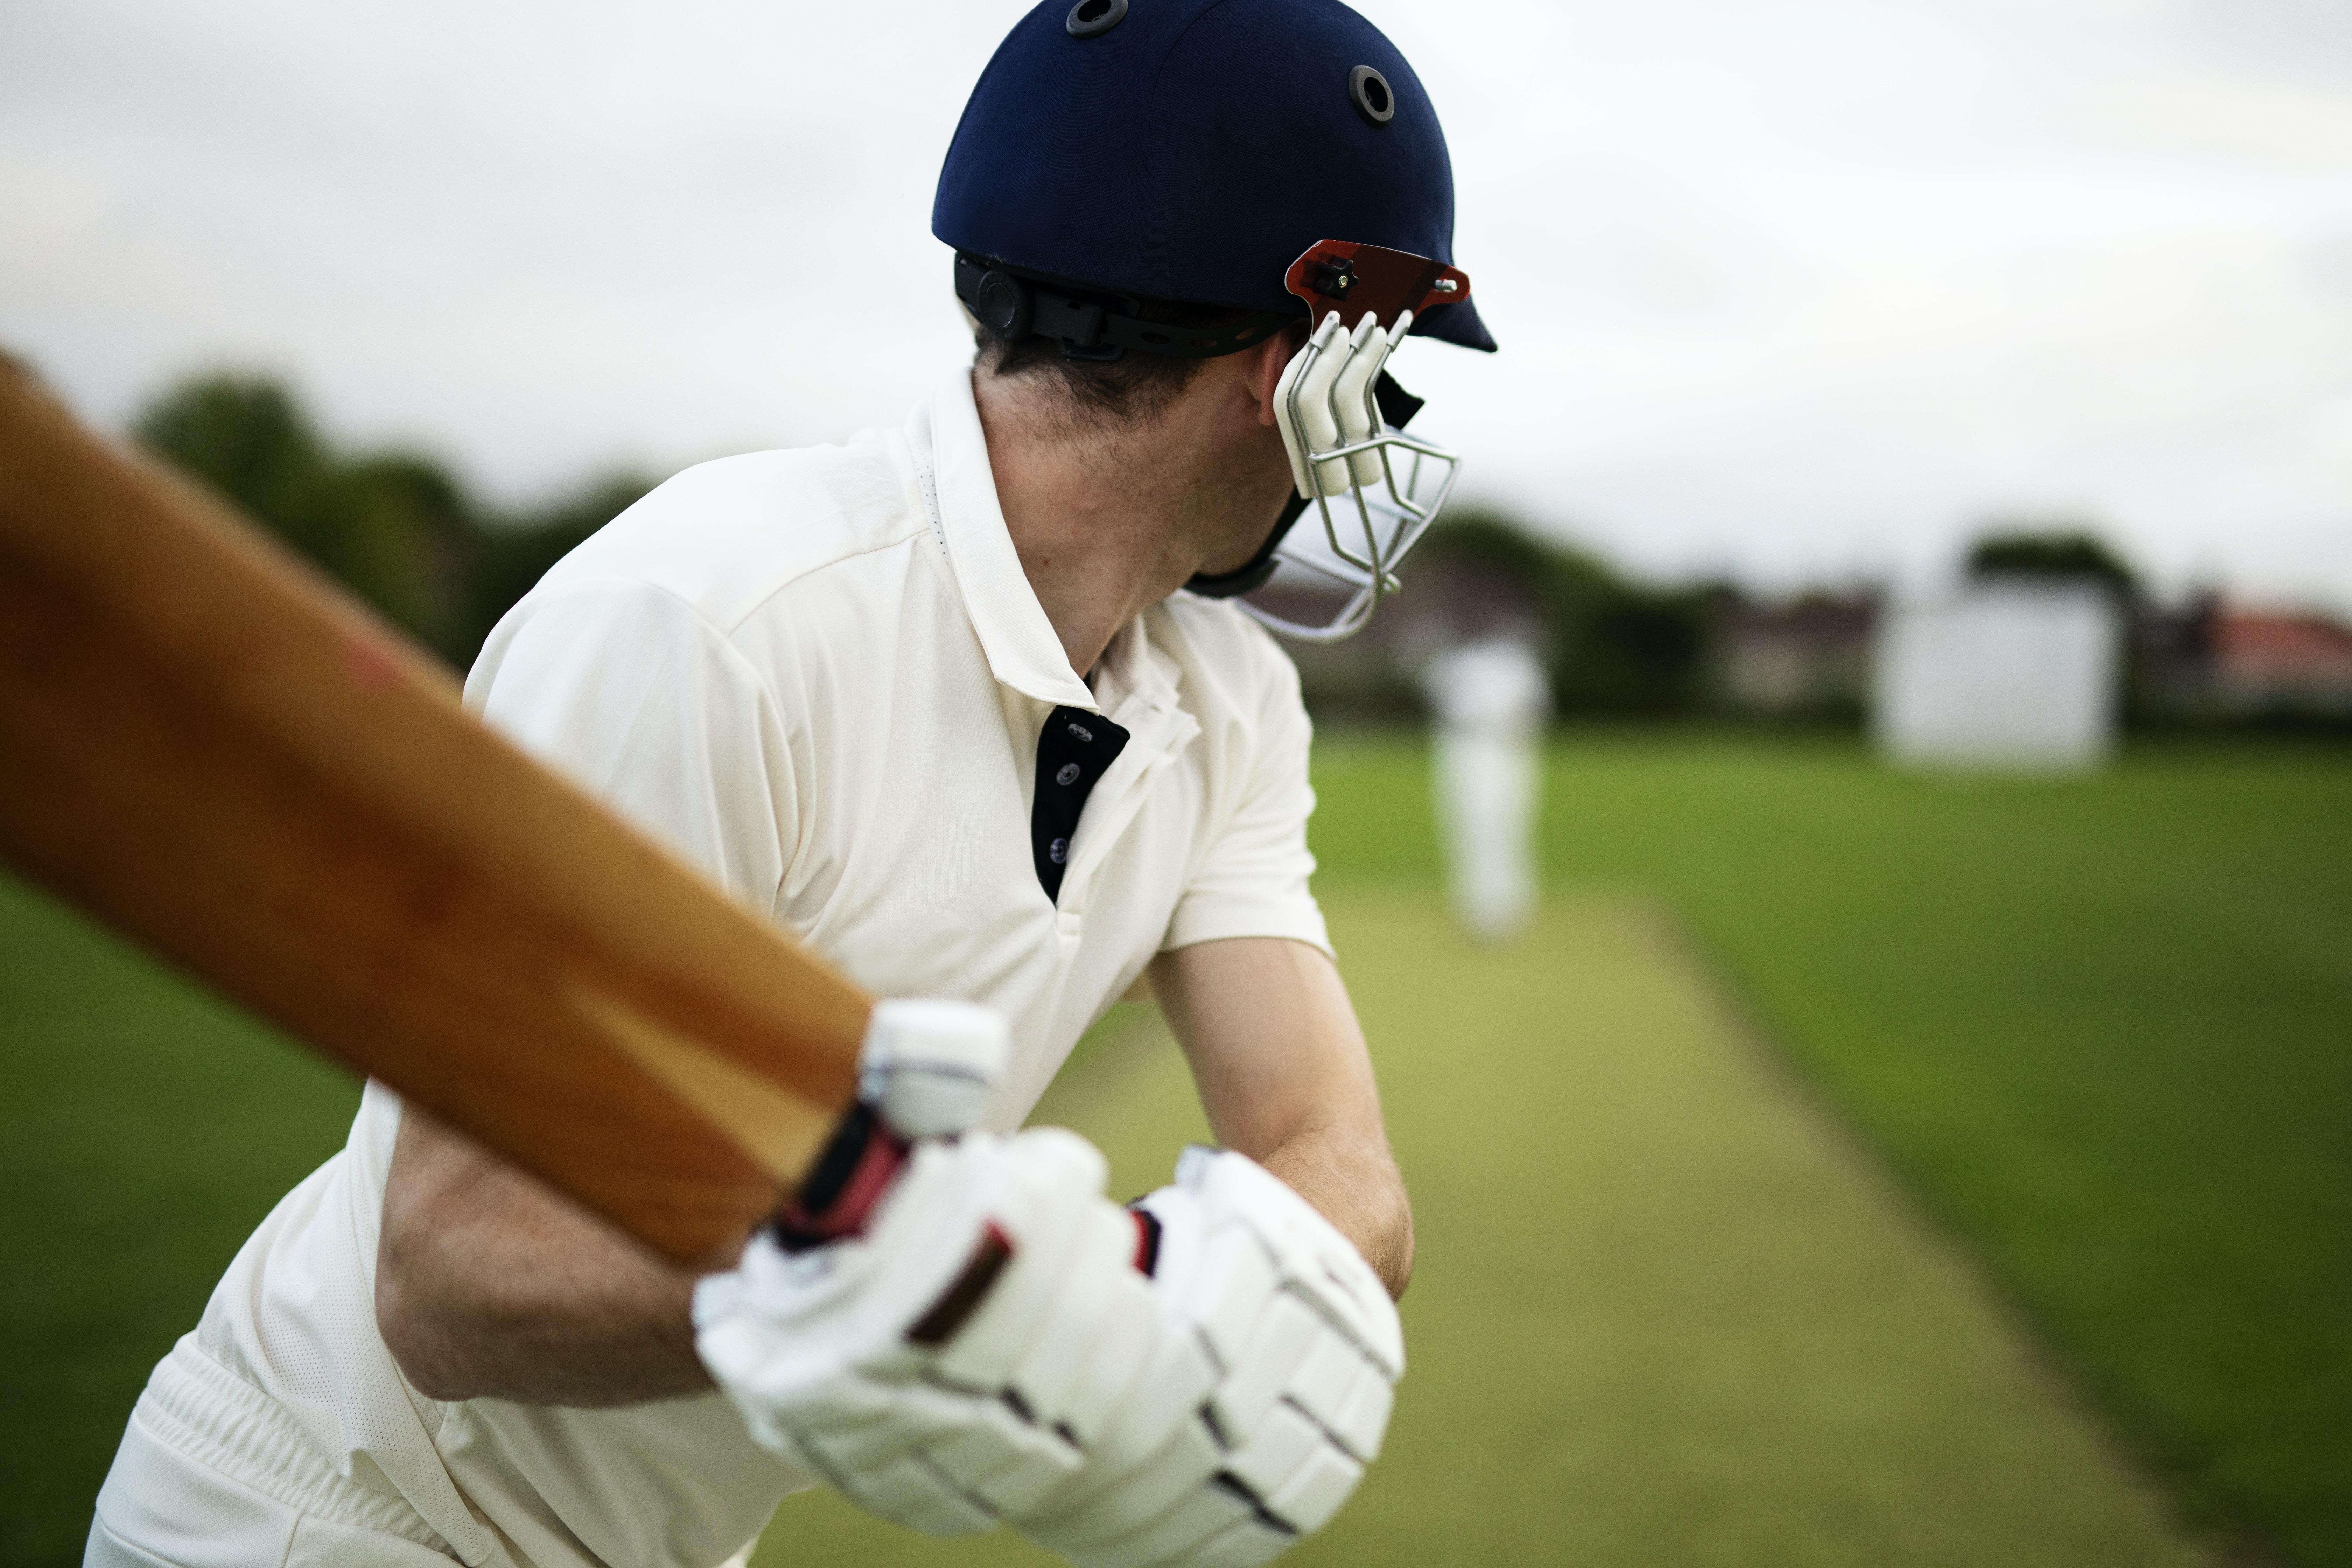 person playing cricket bat during daytime